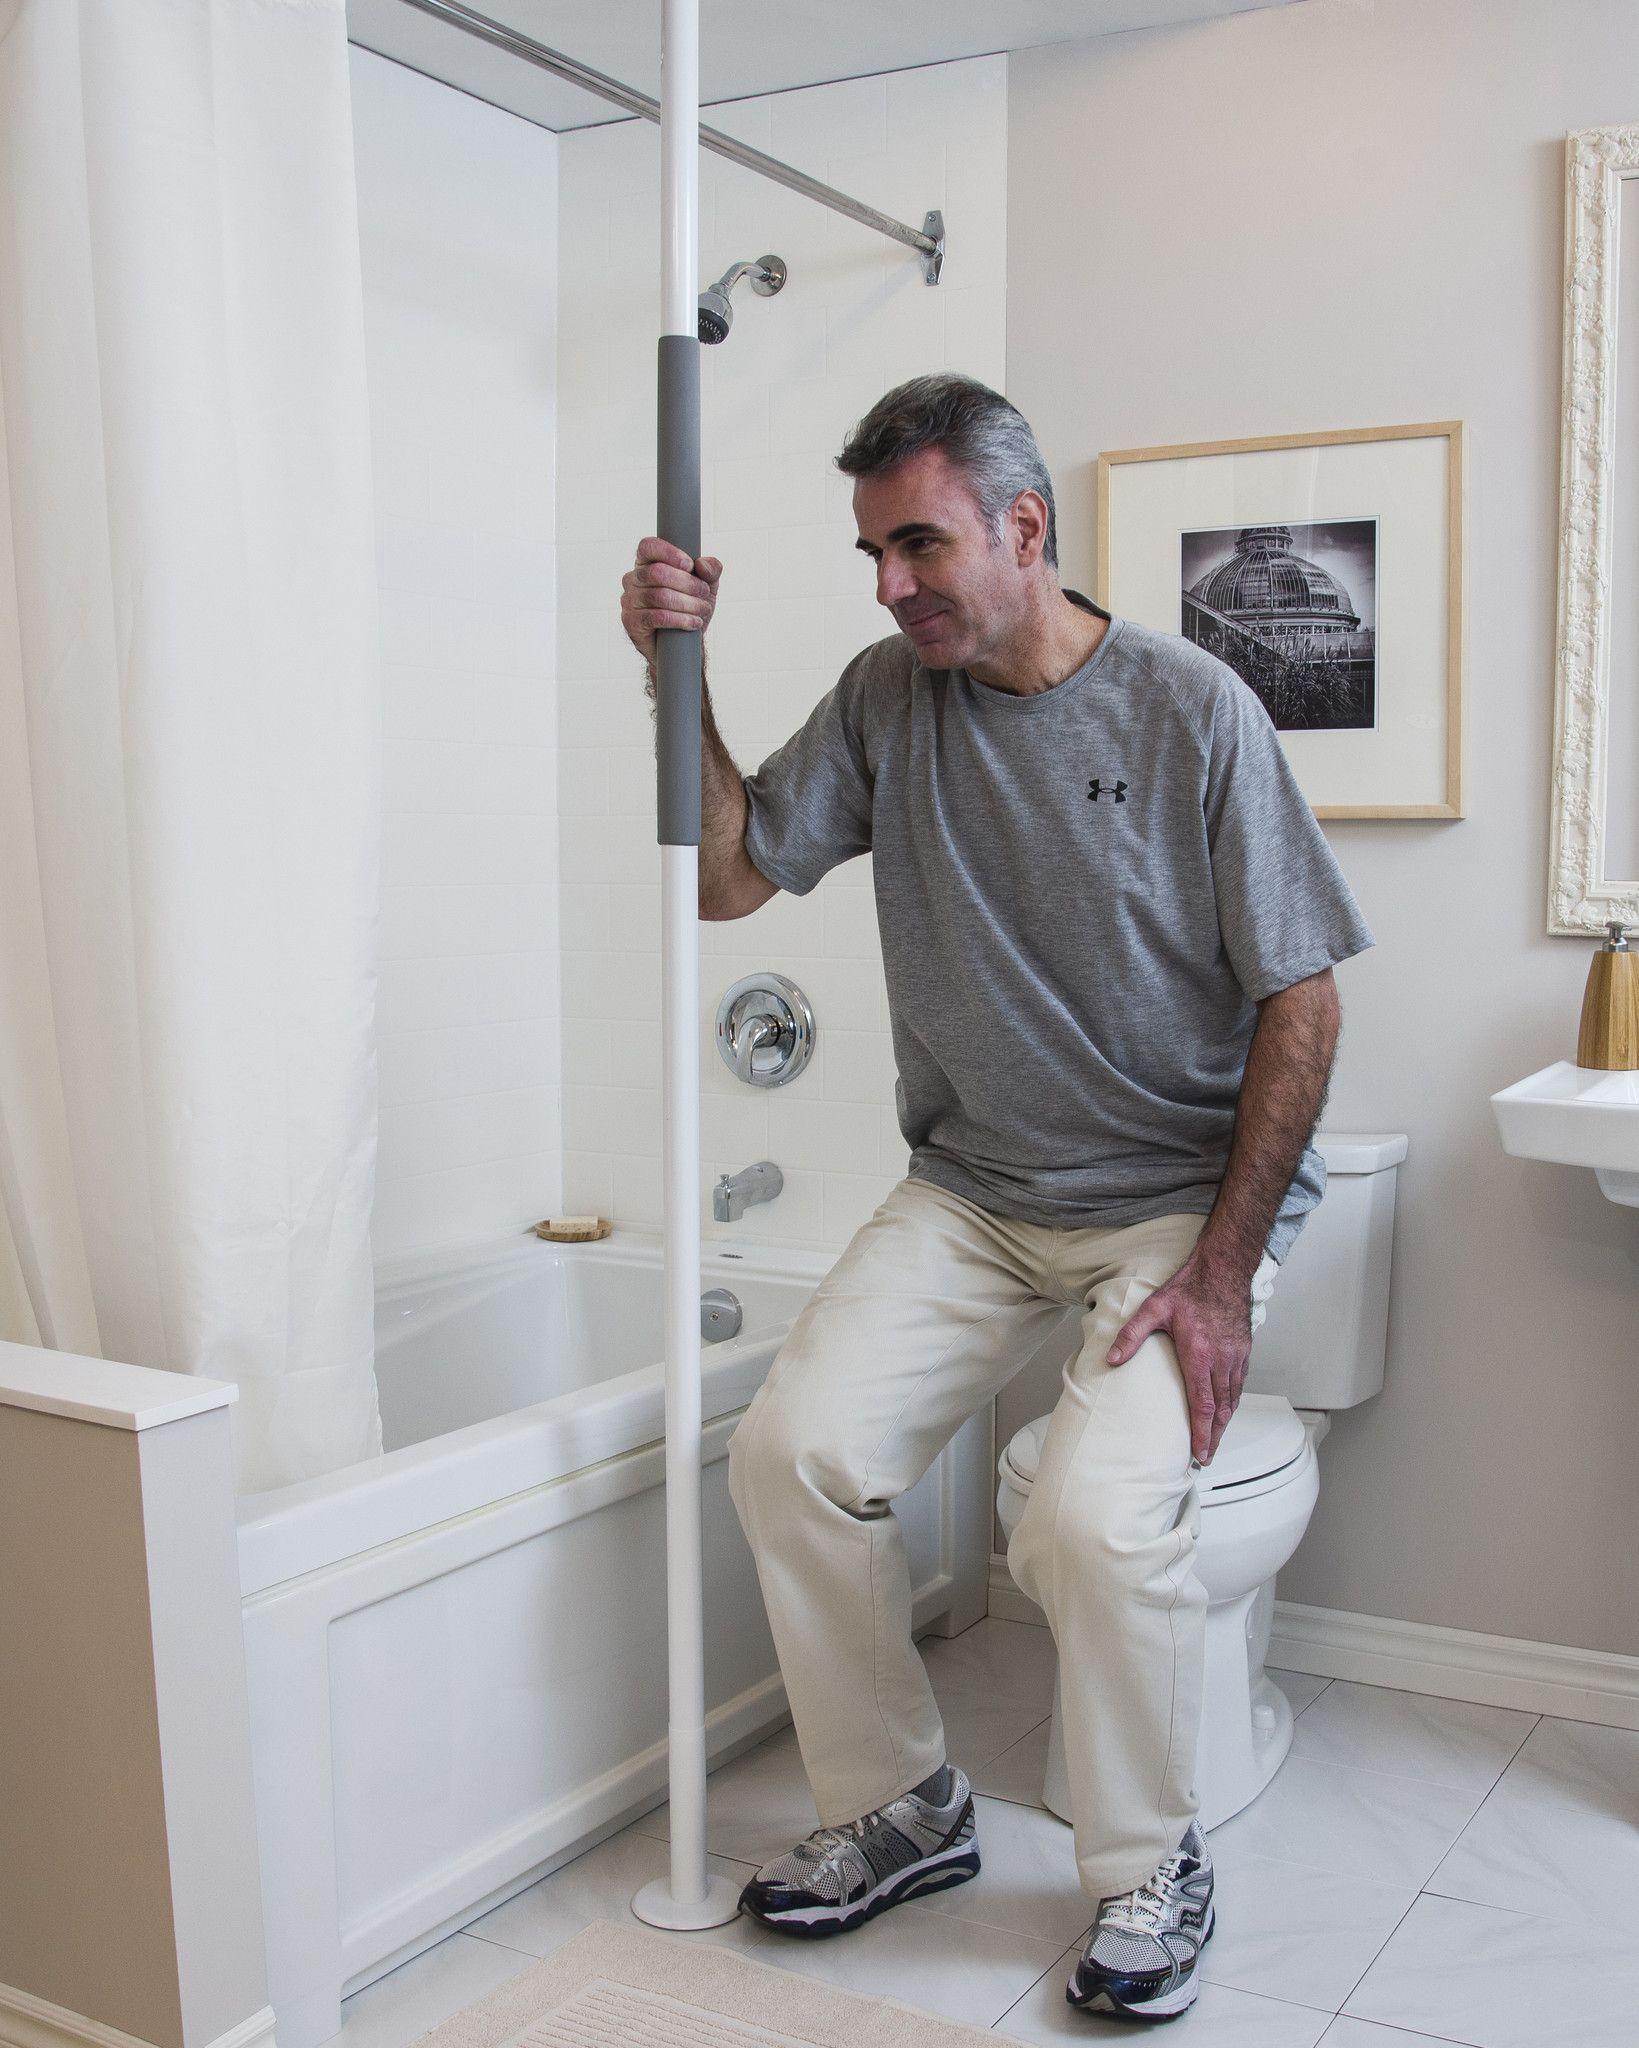 HealthCraft SuperPole SPS Home safety, Bathroom